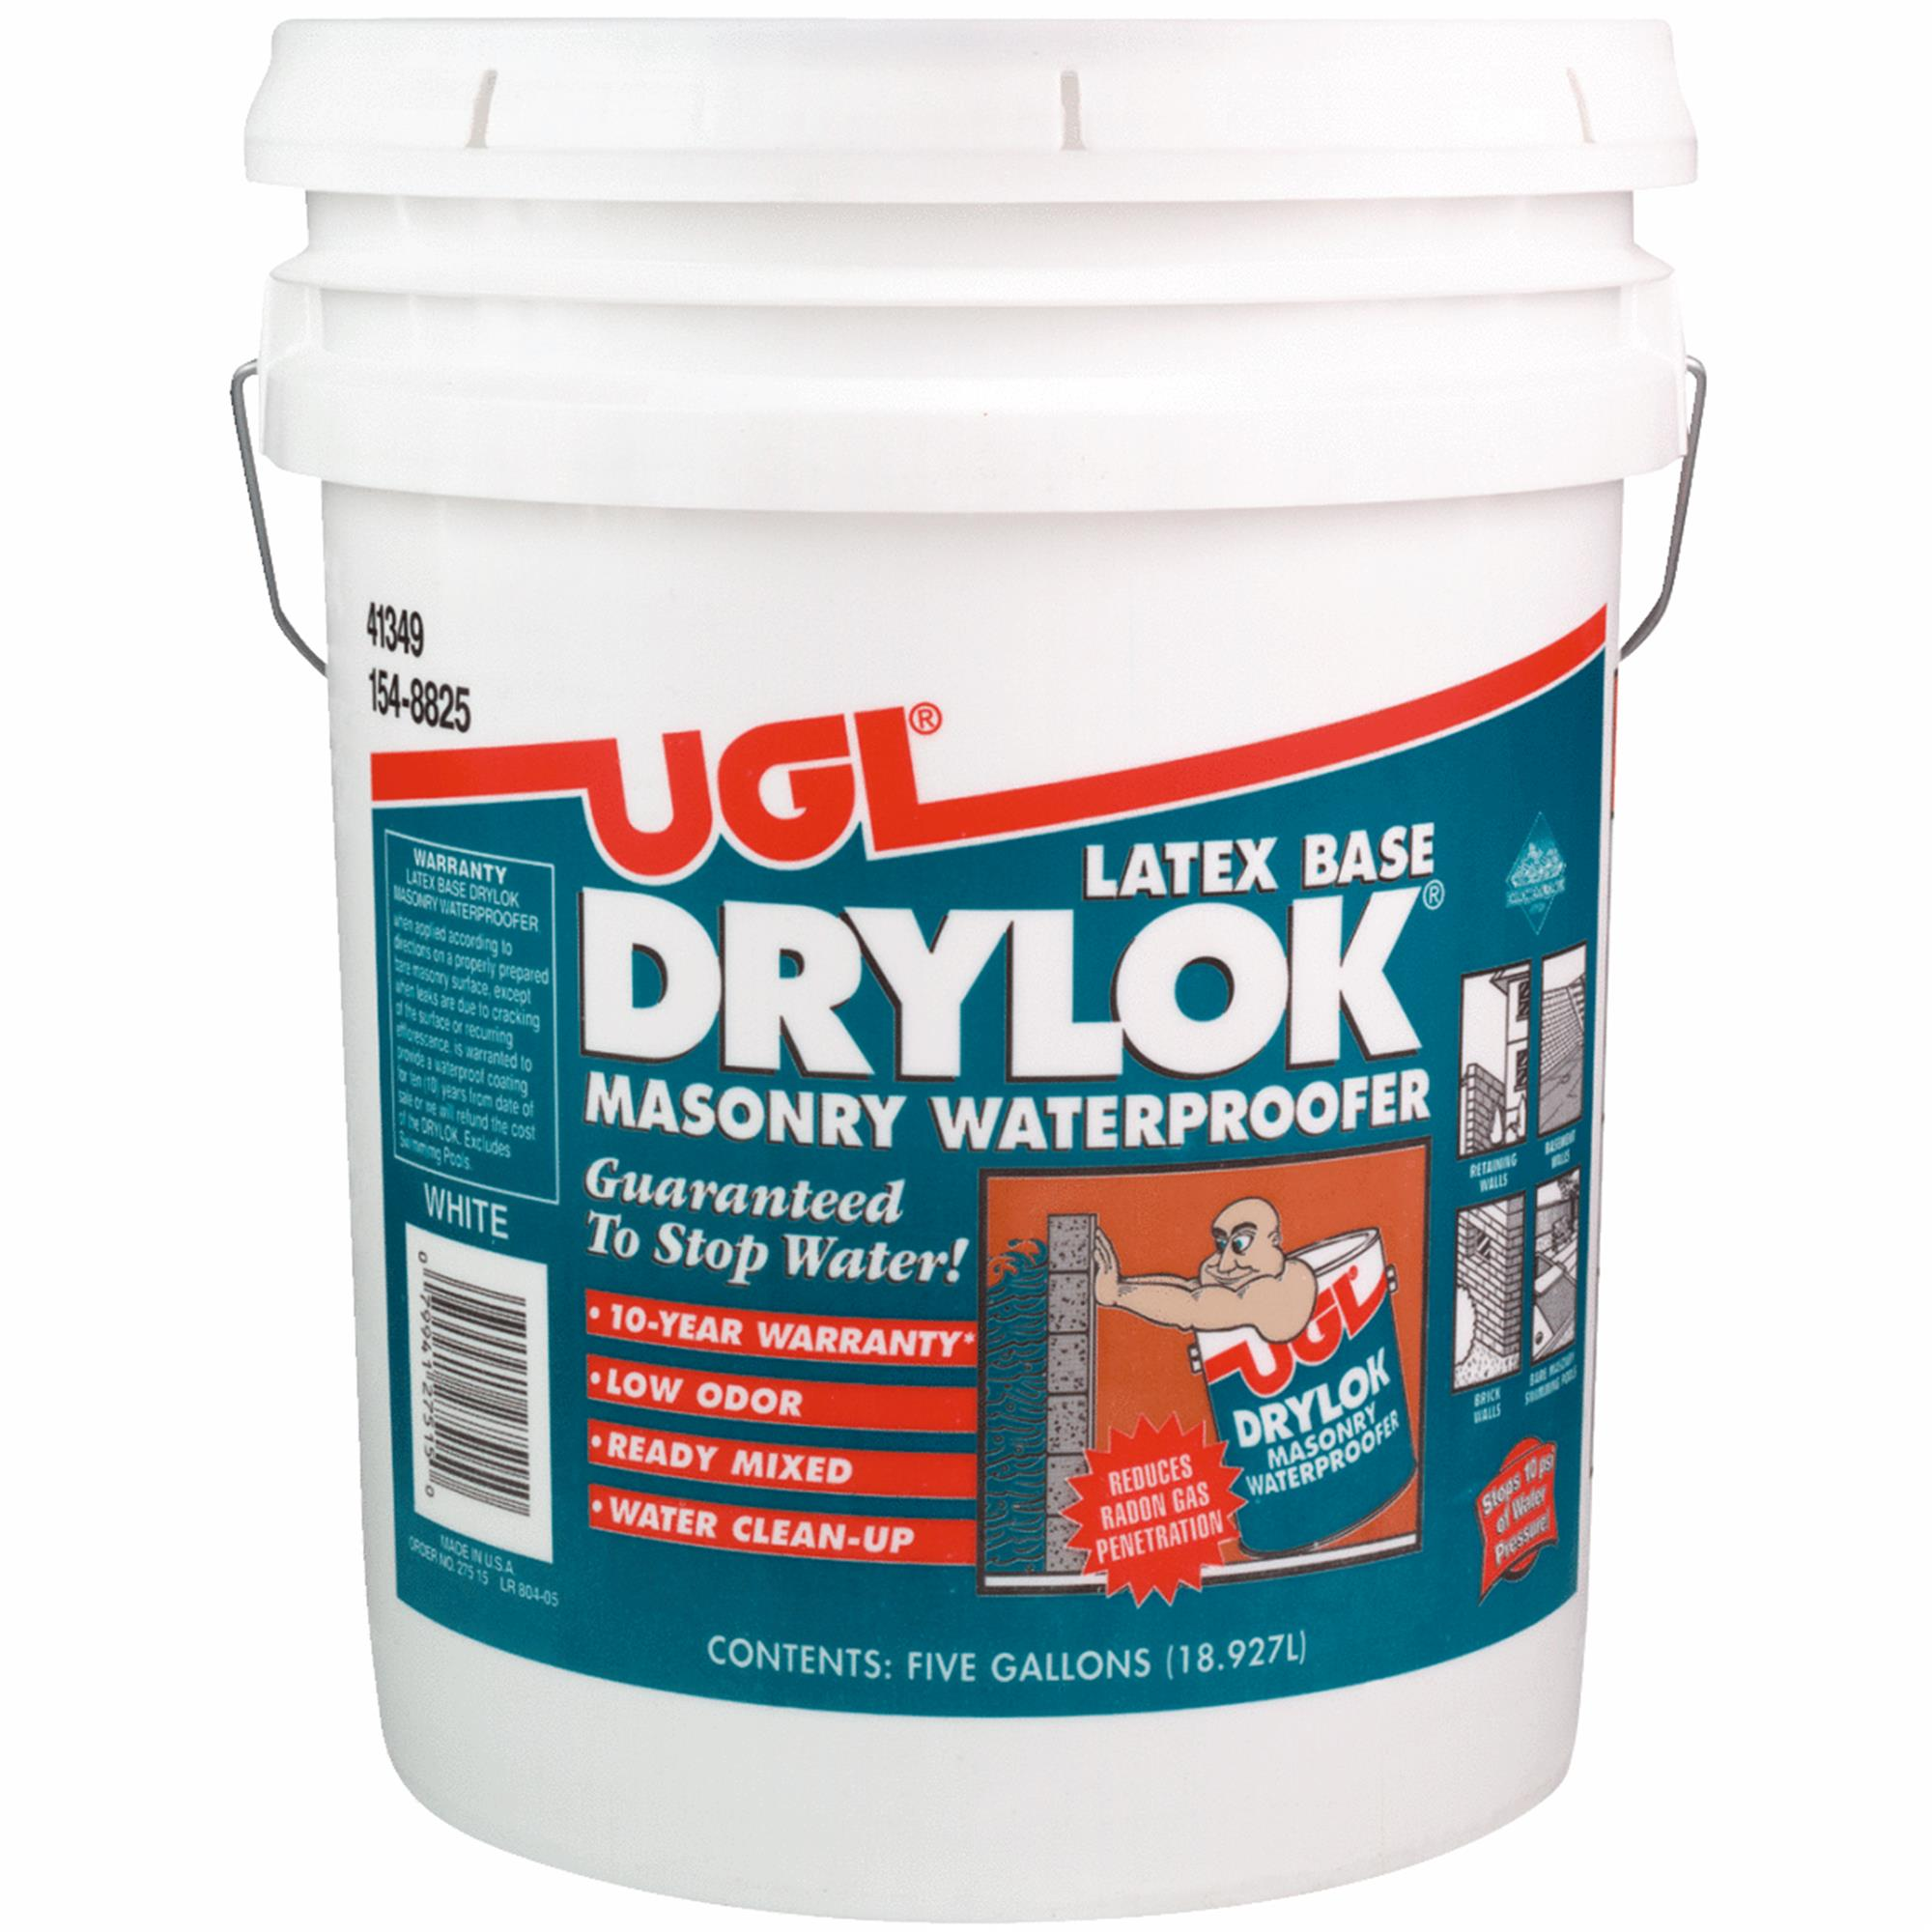 Drylok Latex Masonry Waterproofer by United Gilsonite